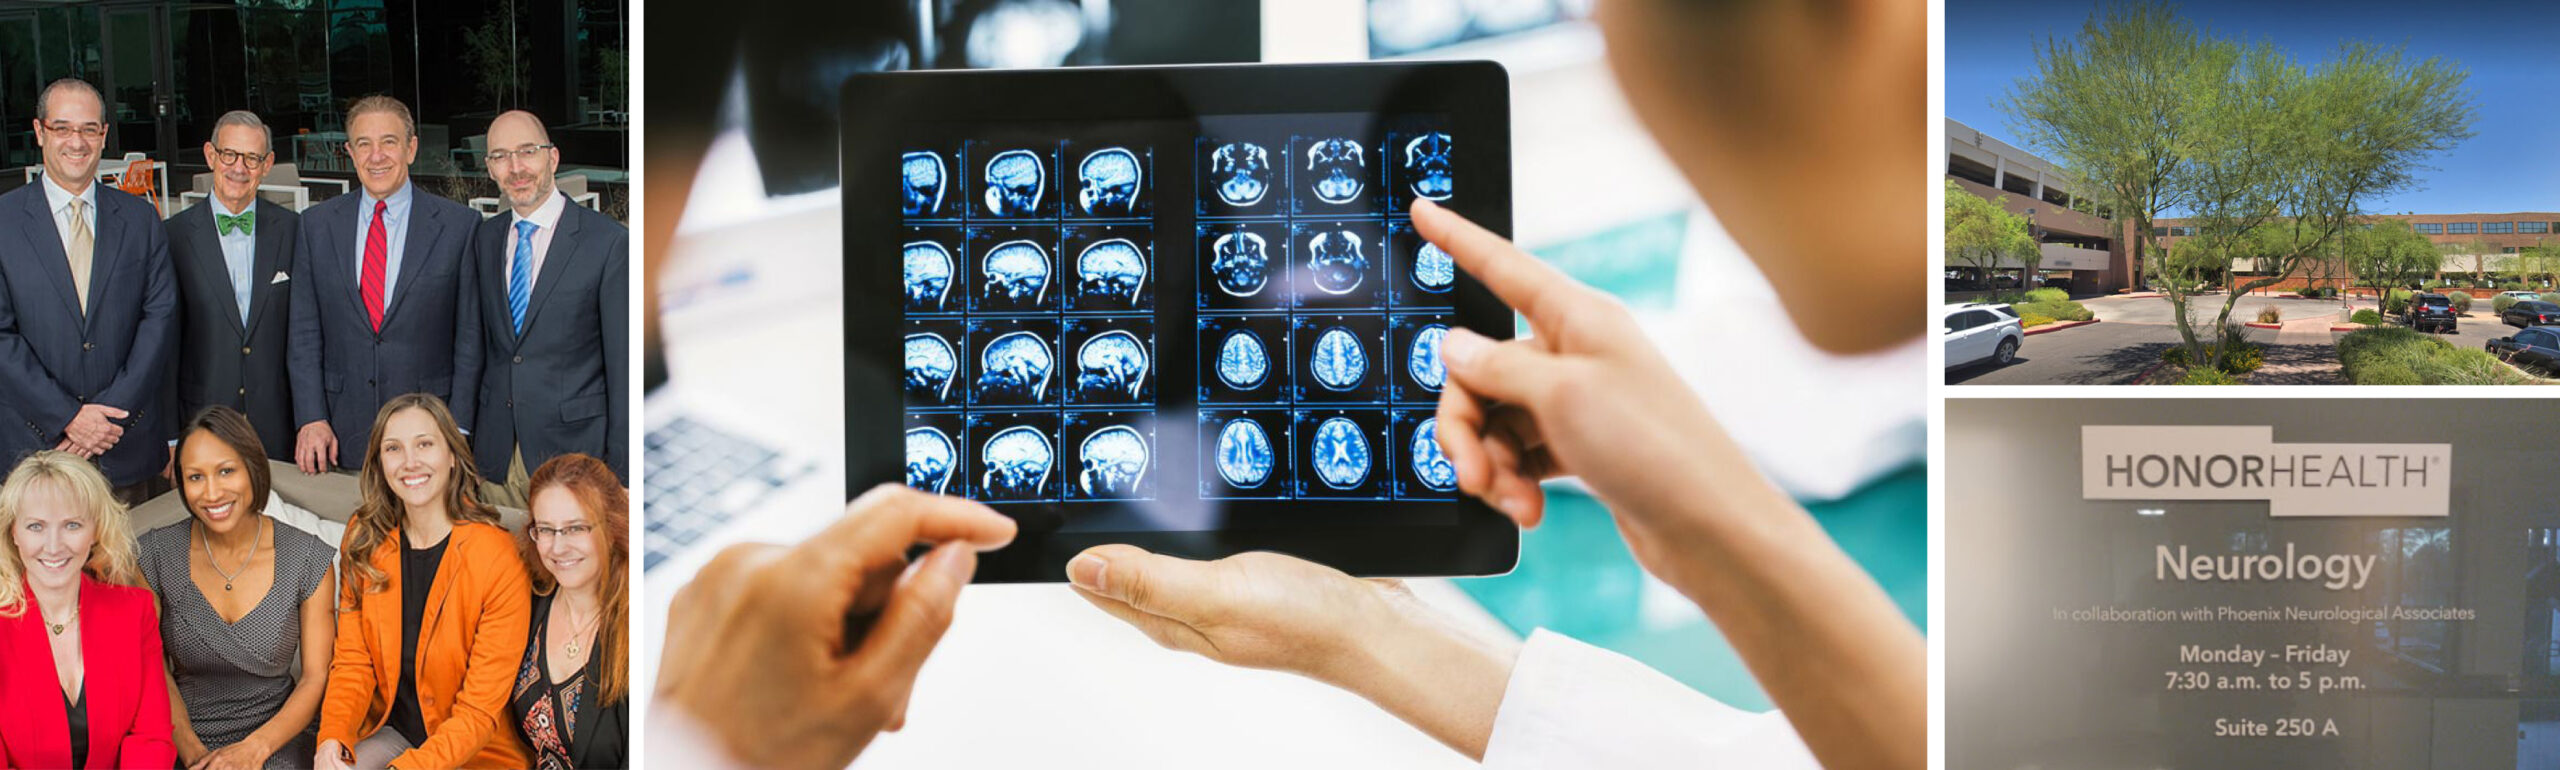 HonorHealth Neurology is one of the best!